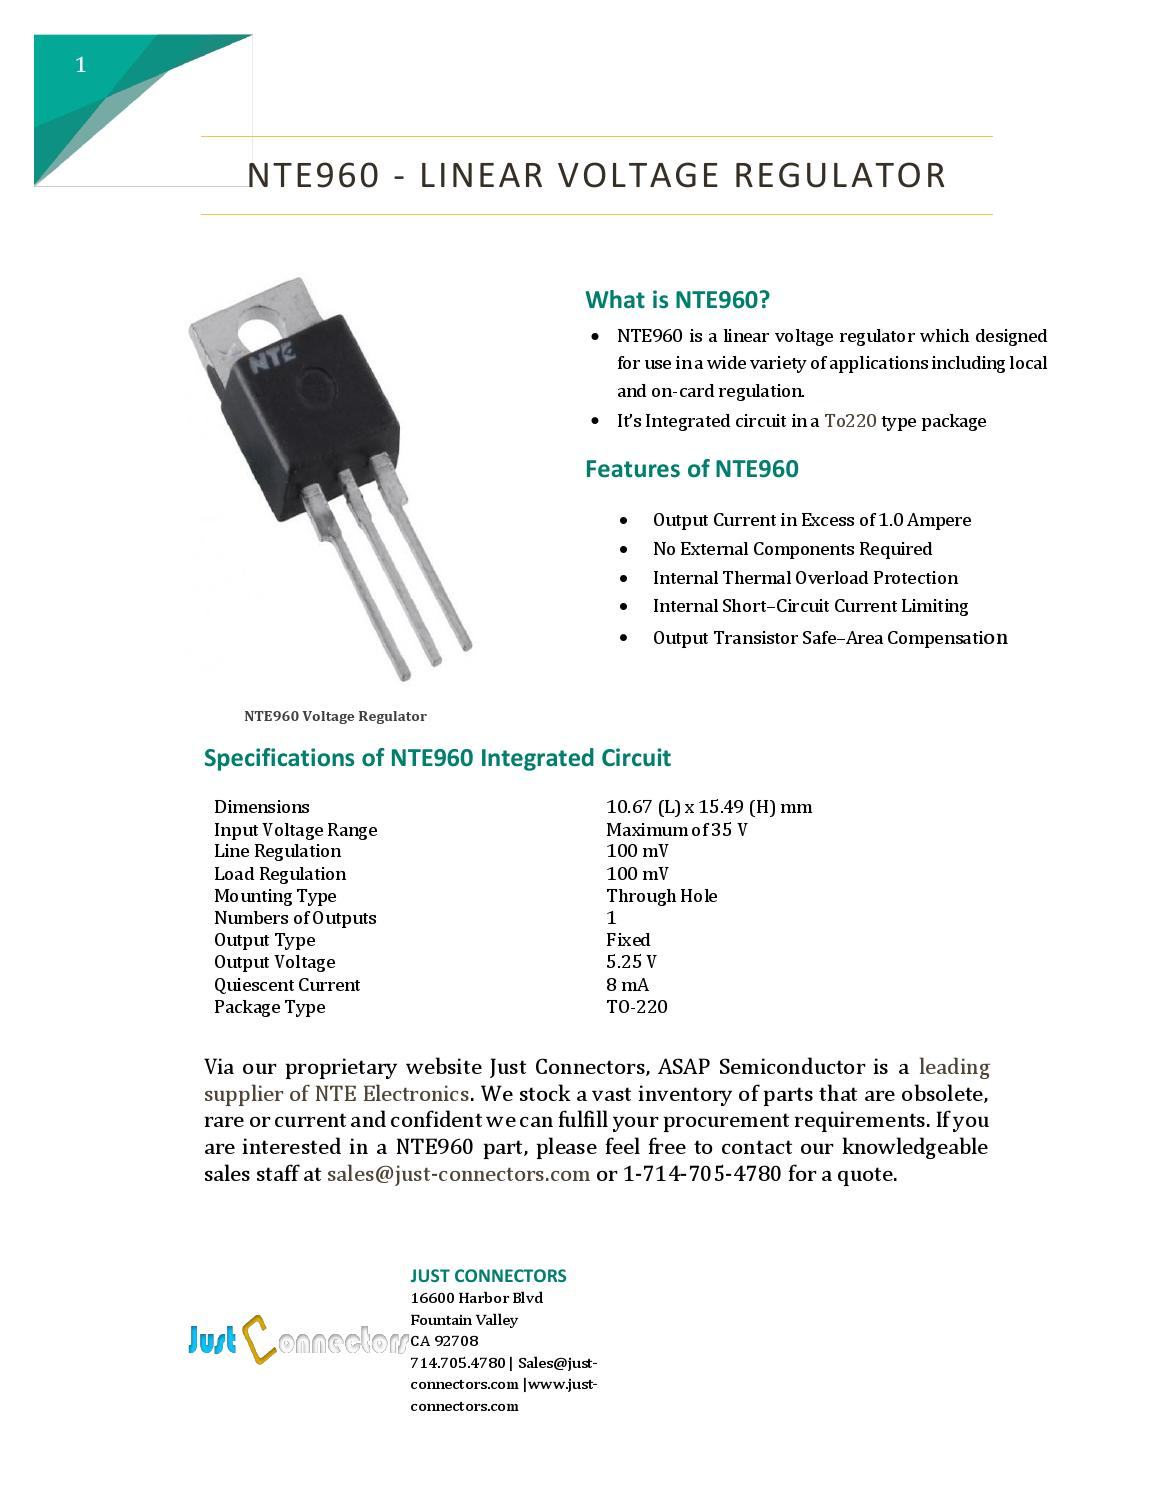 Brilliant Nte960 Linear Voltage Regulator By Just Connectors Issuu Wiring Cloud Grayisramohammedshrineorg